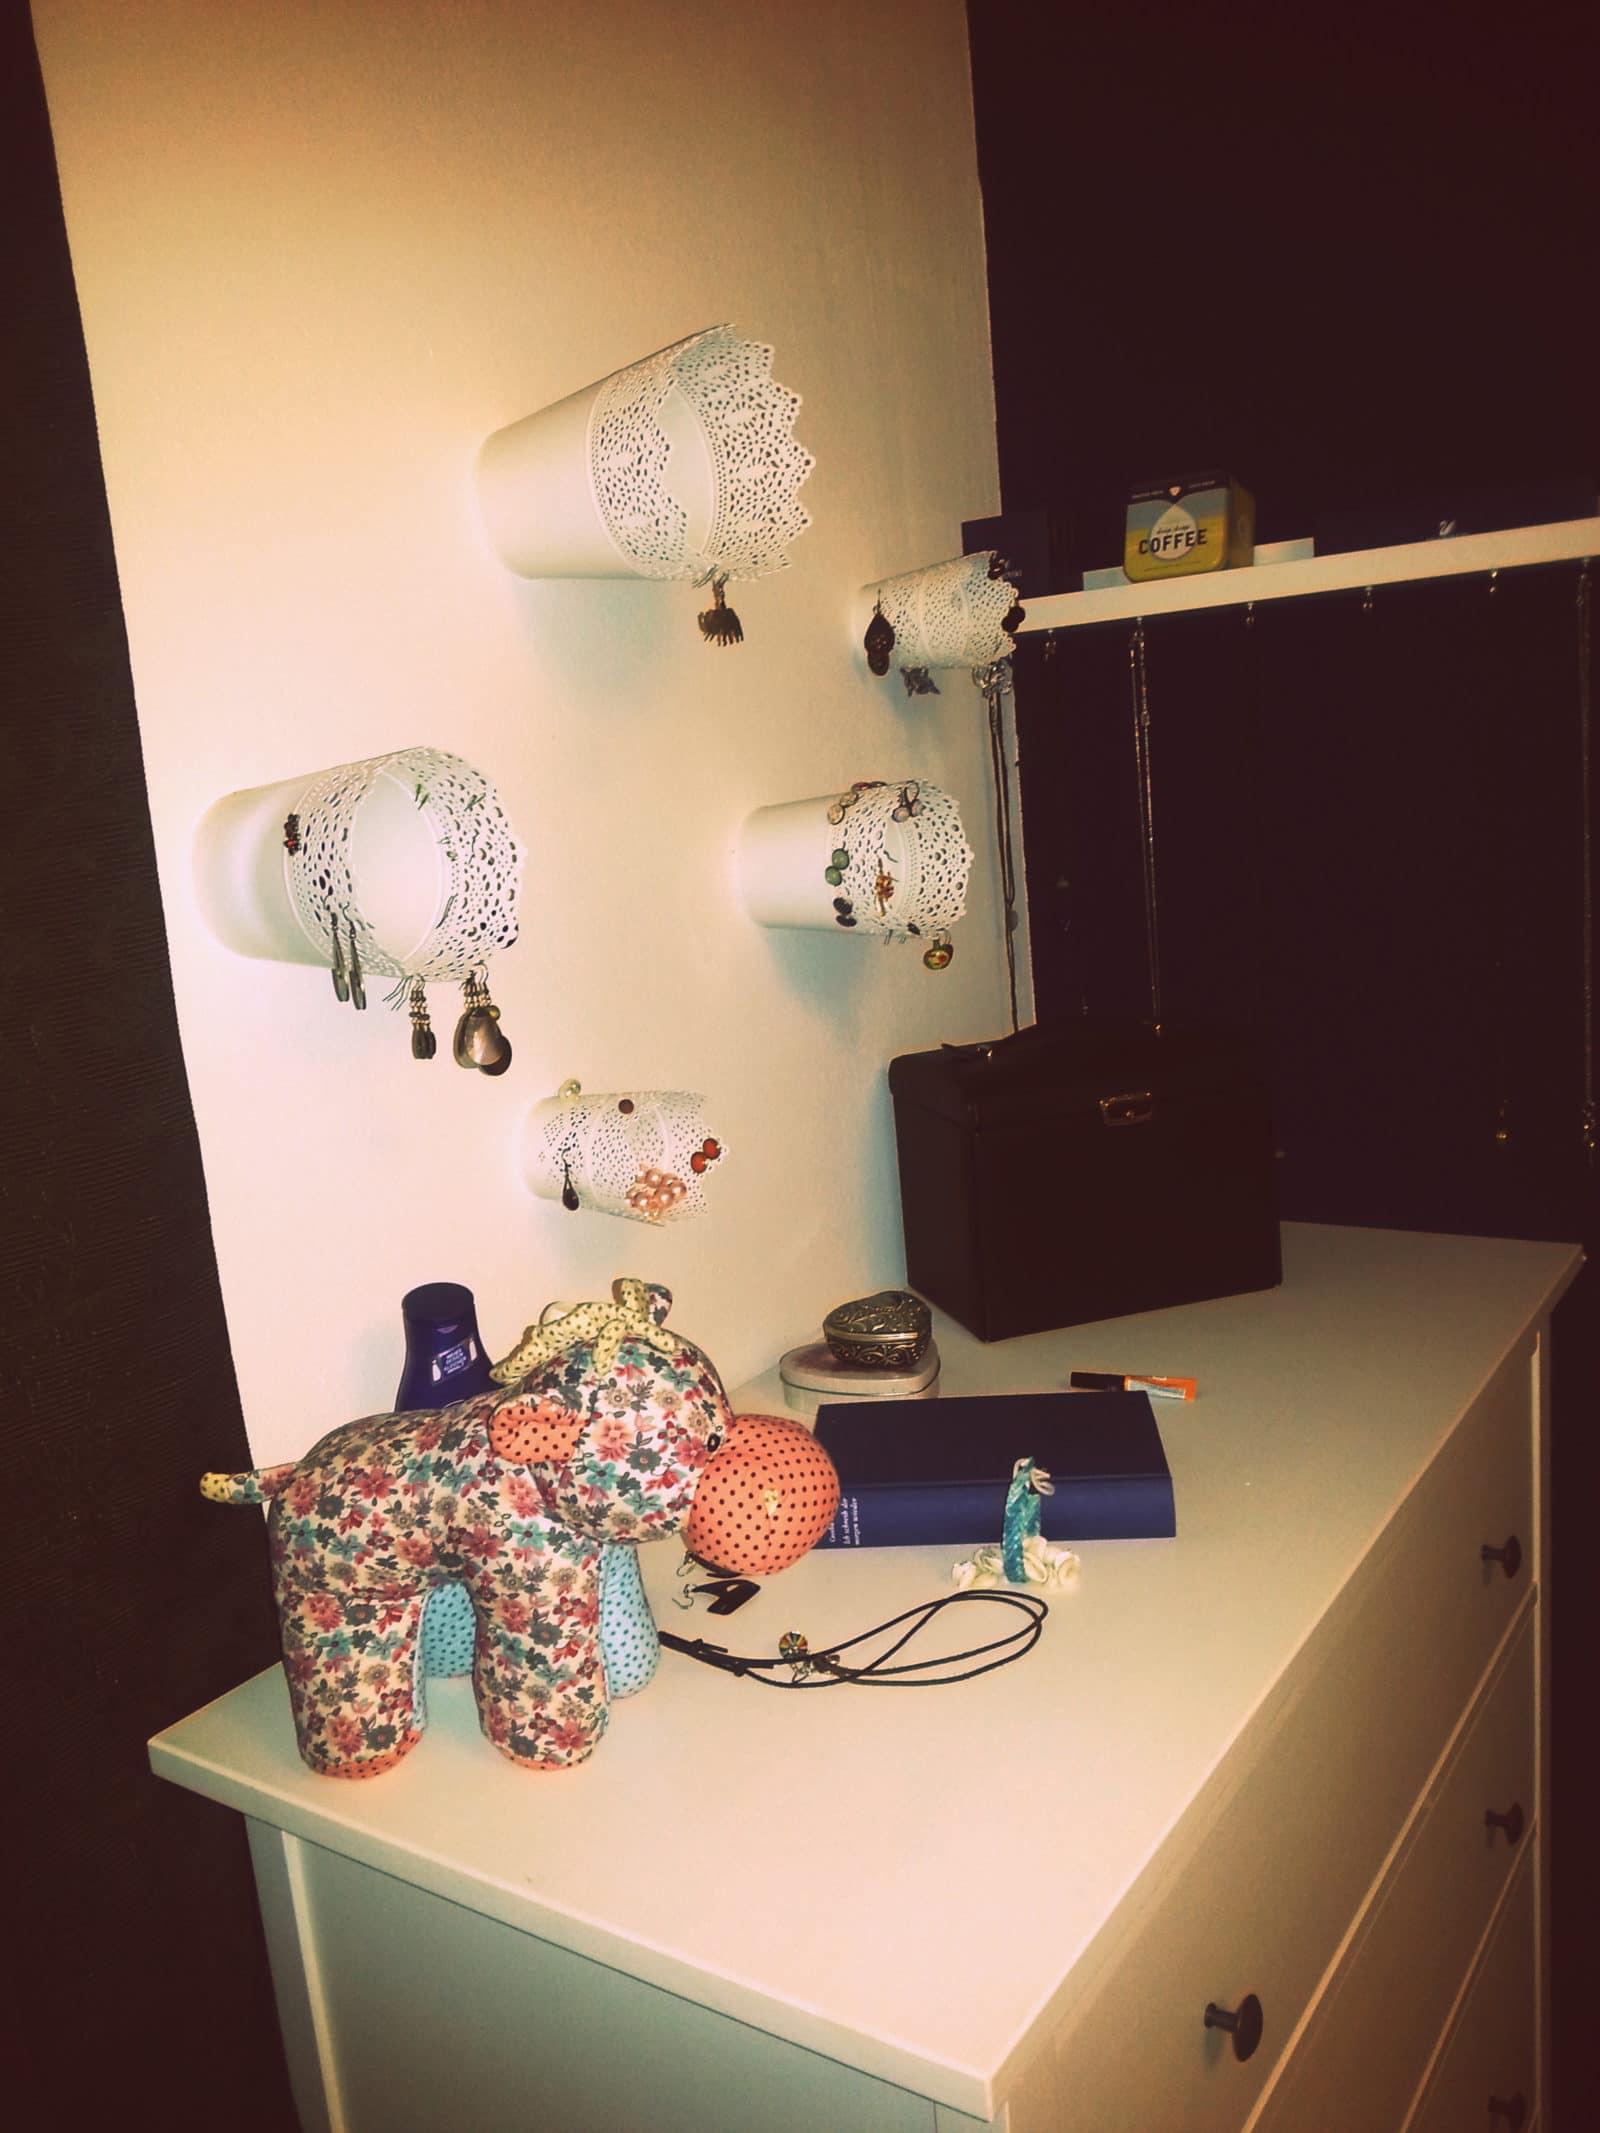 schmuckaufbewahrung aus ikea t pfen handmade kultur. Black Bedroom Furniture Sets. Home Design Ideas